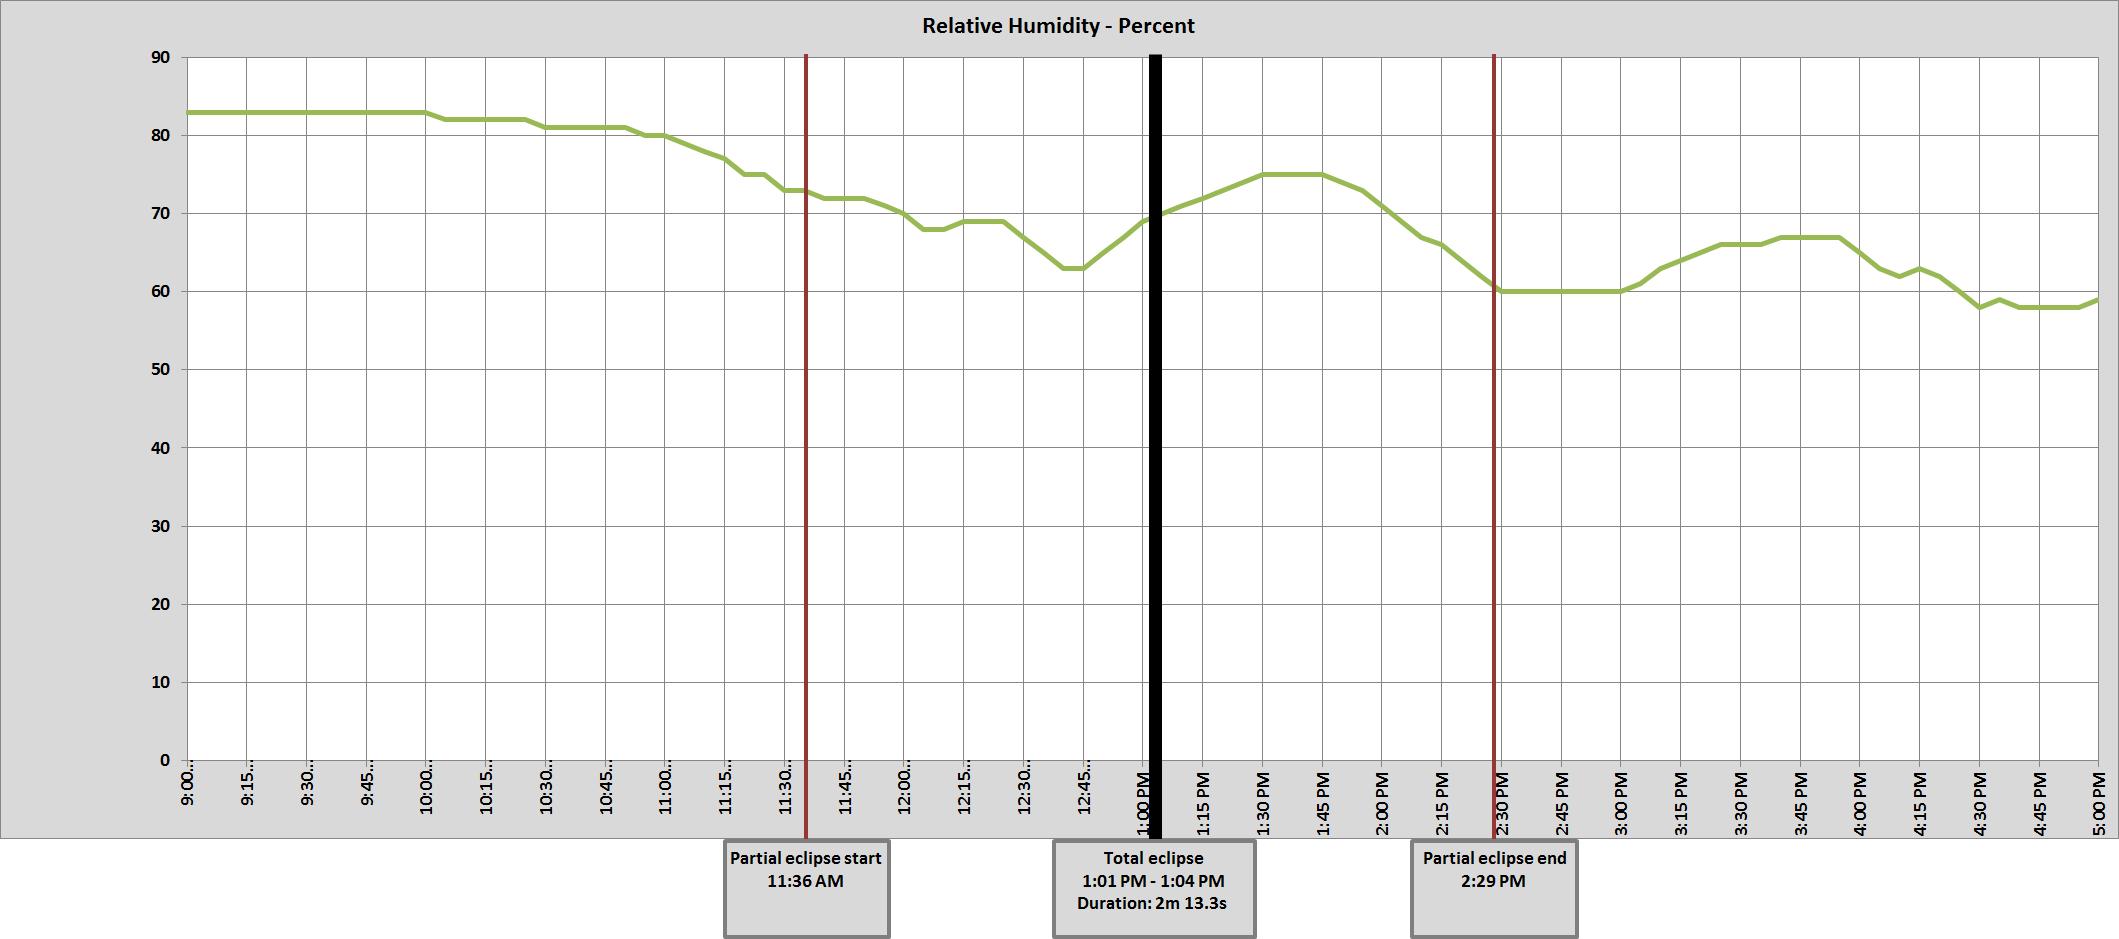 Graph of NE Lincoln 11 SW relative humidity